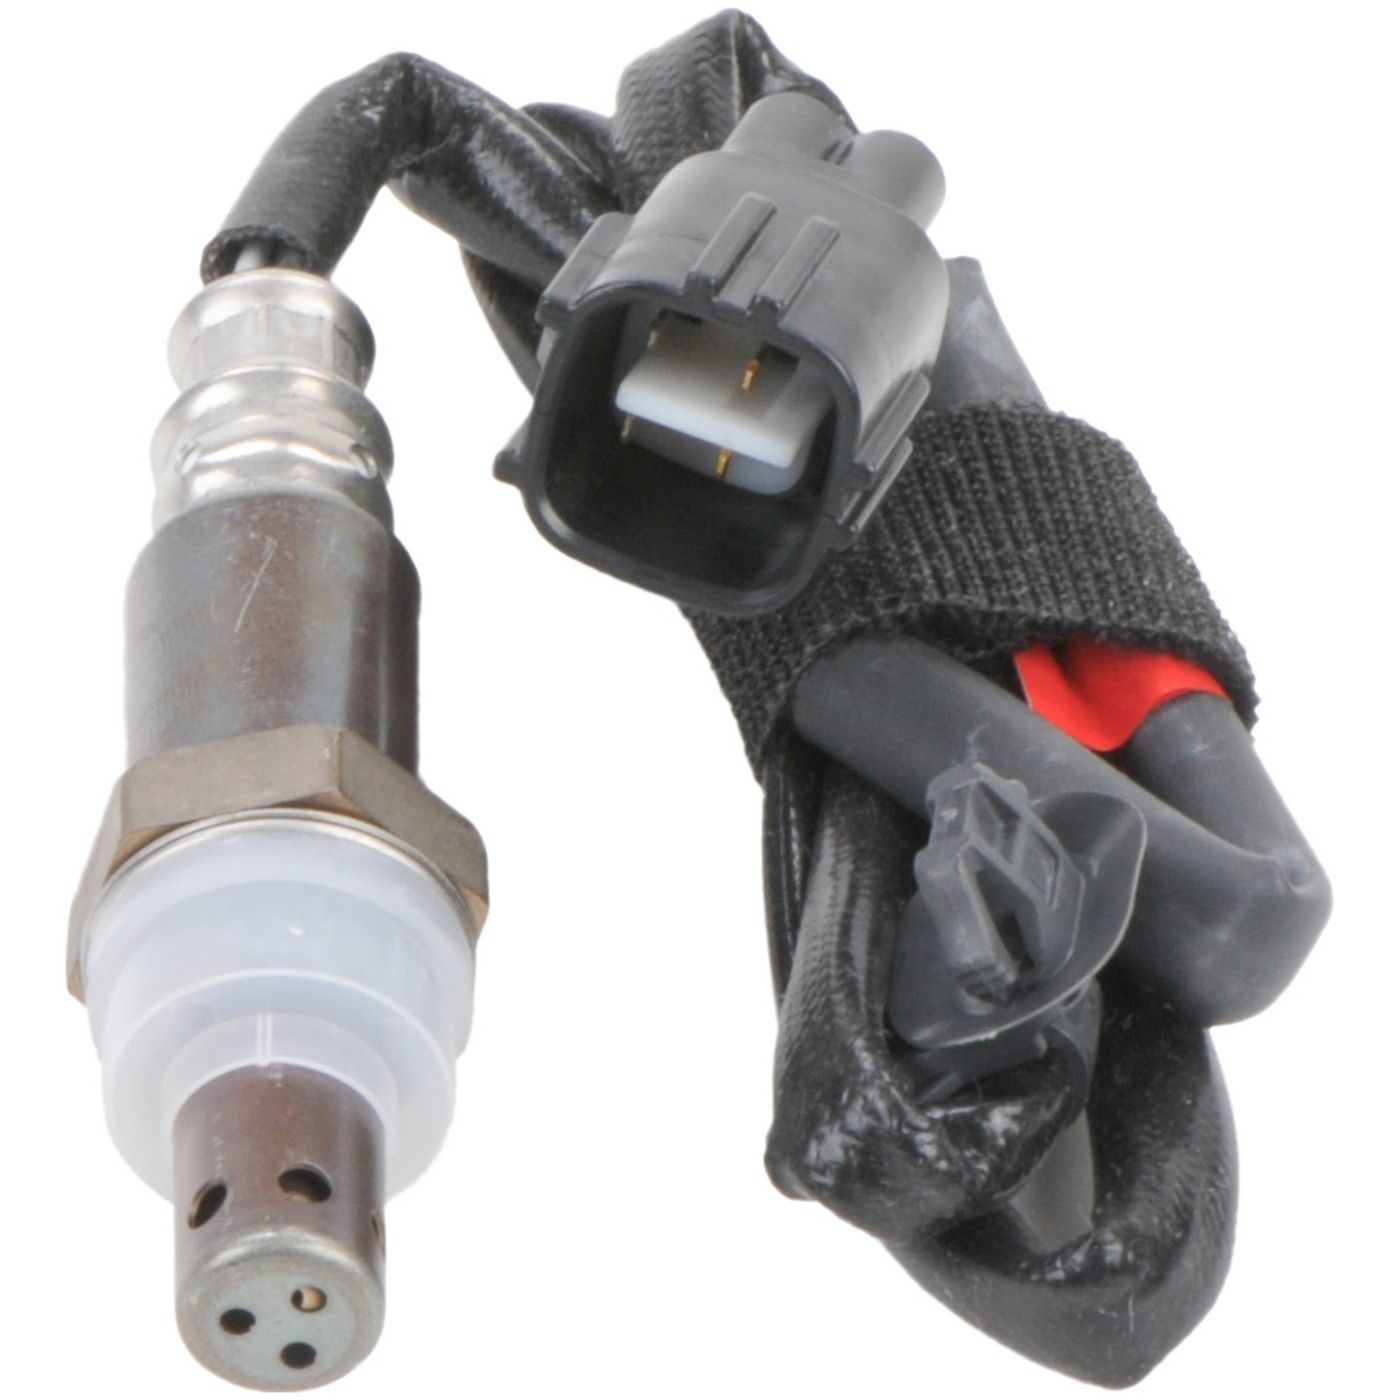 O2 Sensor Gas Mileage: 2003 Toyota Highlander Oxygen Sensor